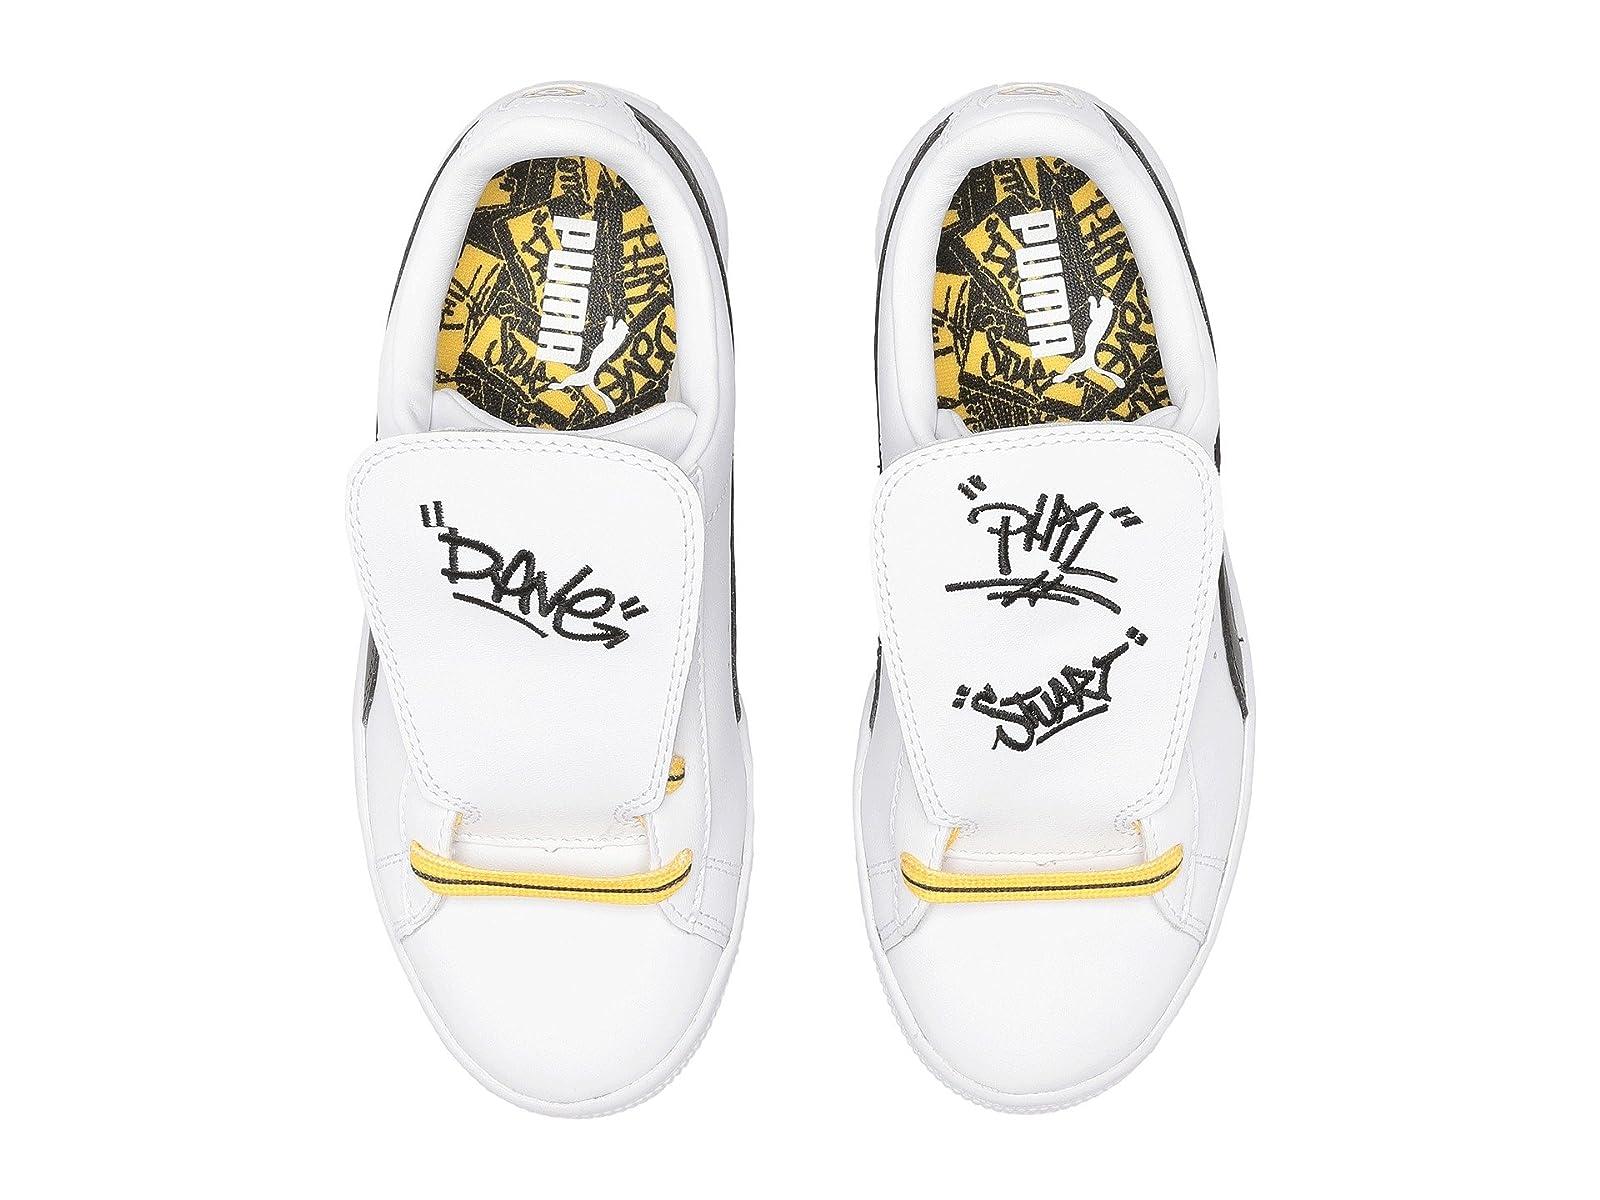 Puma Kids Minions Basket Tongue (Little Kid)Atmospheric grades have affordable shoes